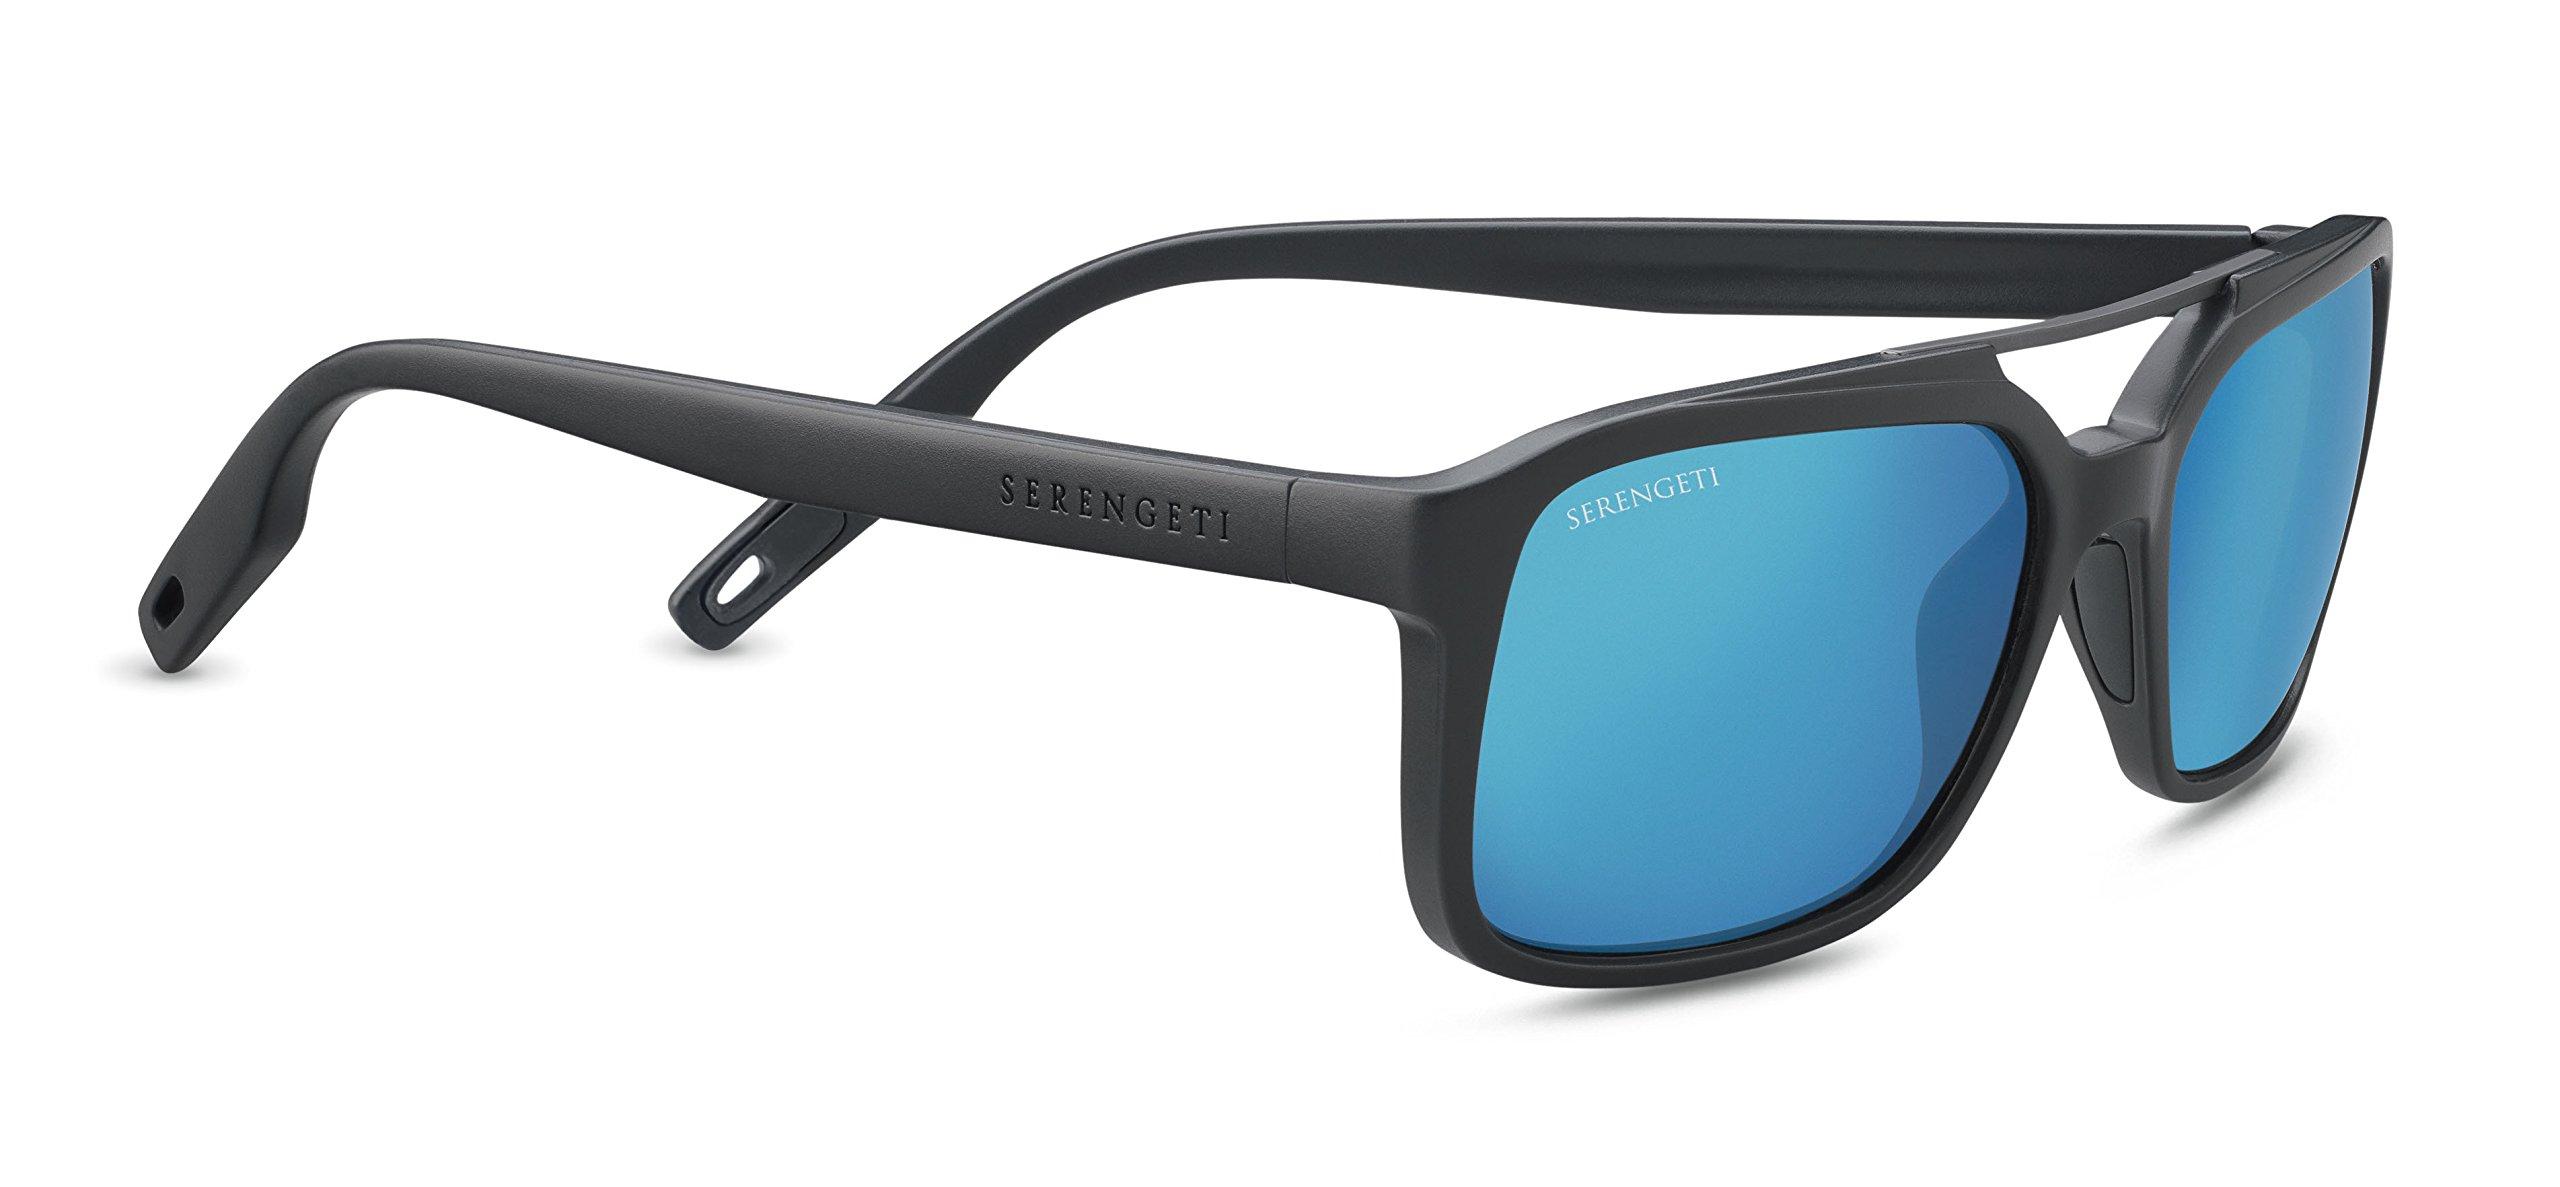 Serengeti Renzo Sunglasses Satin Dark Grey/Satin Dark Gunmetal, Blue